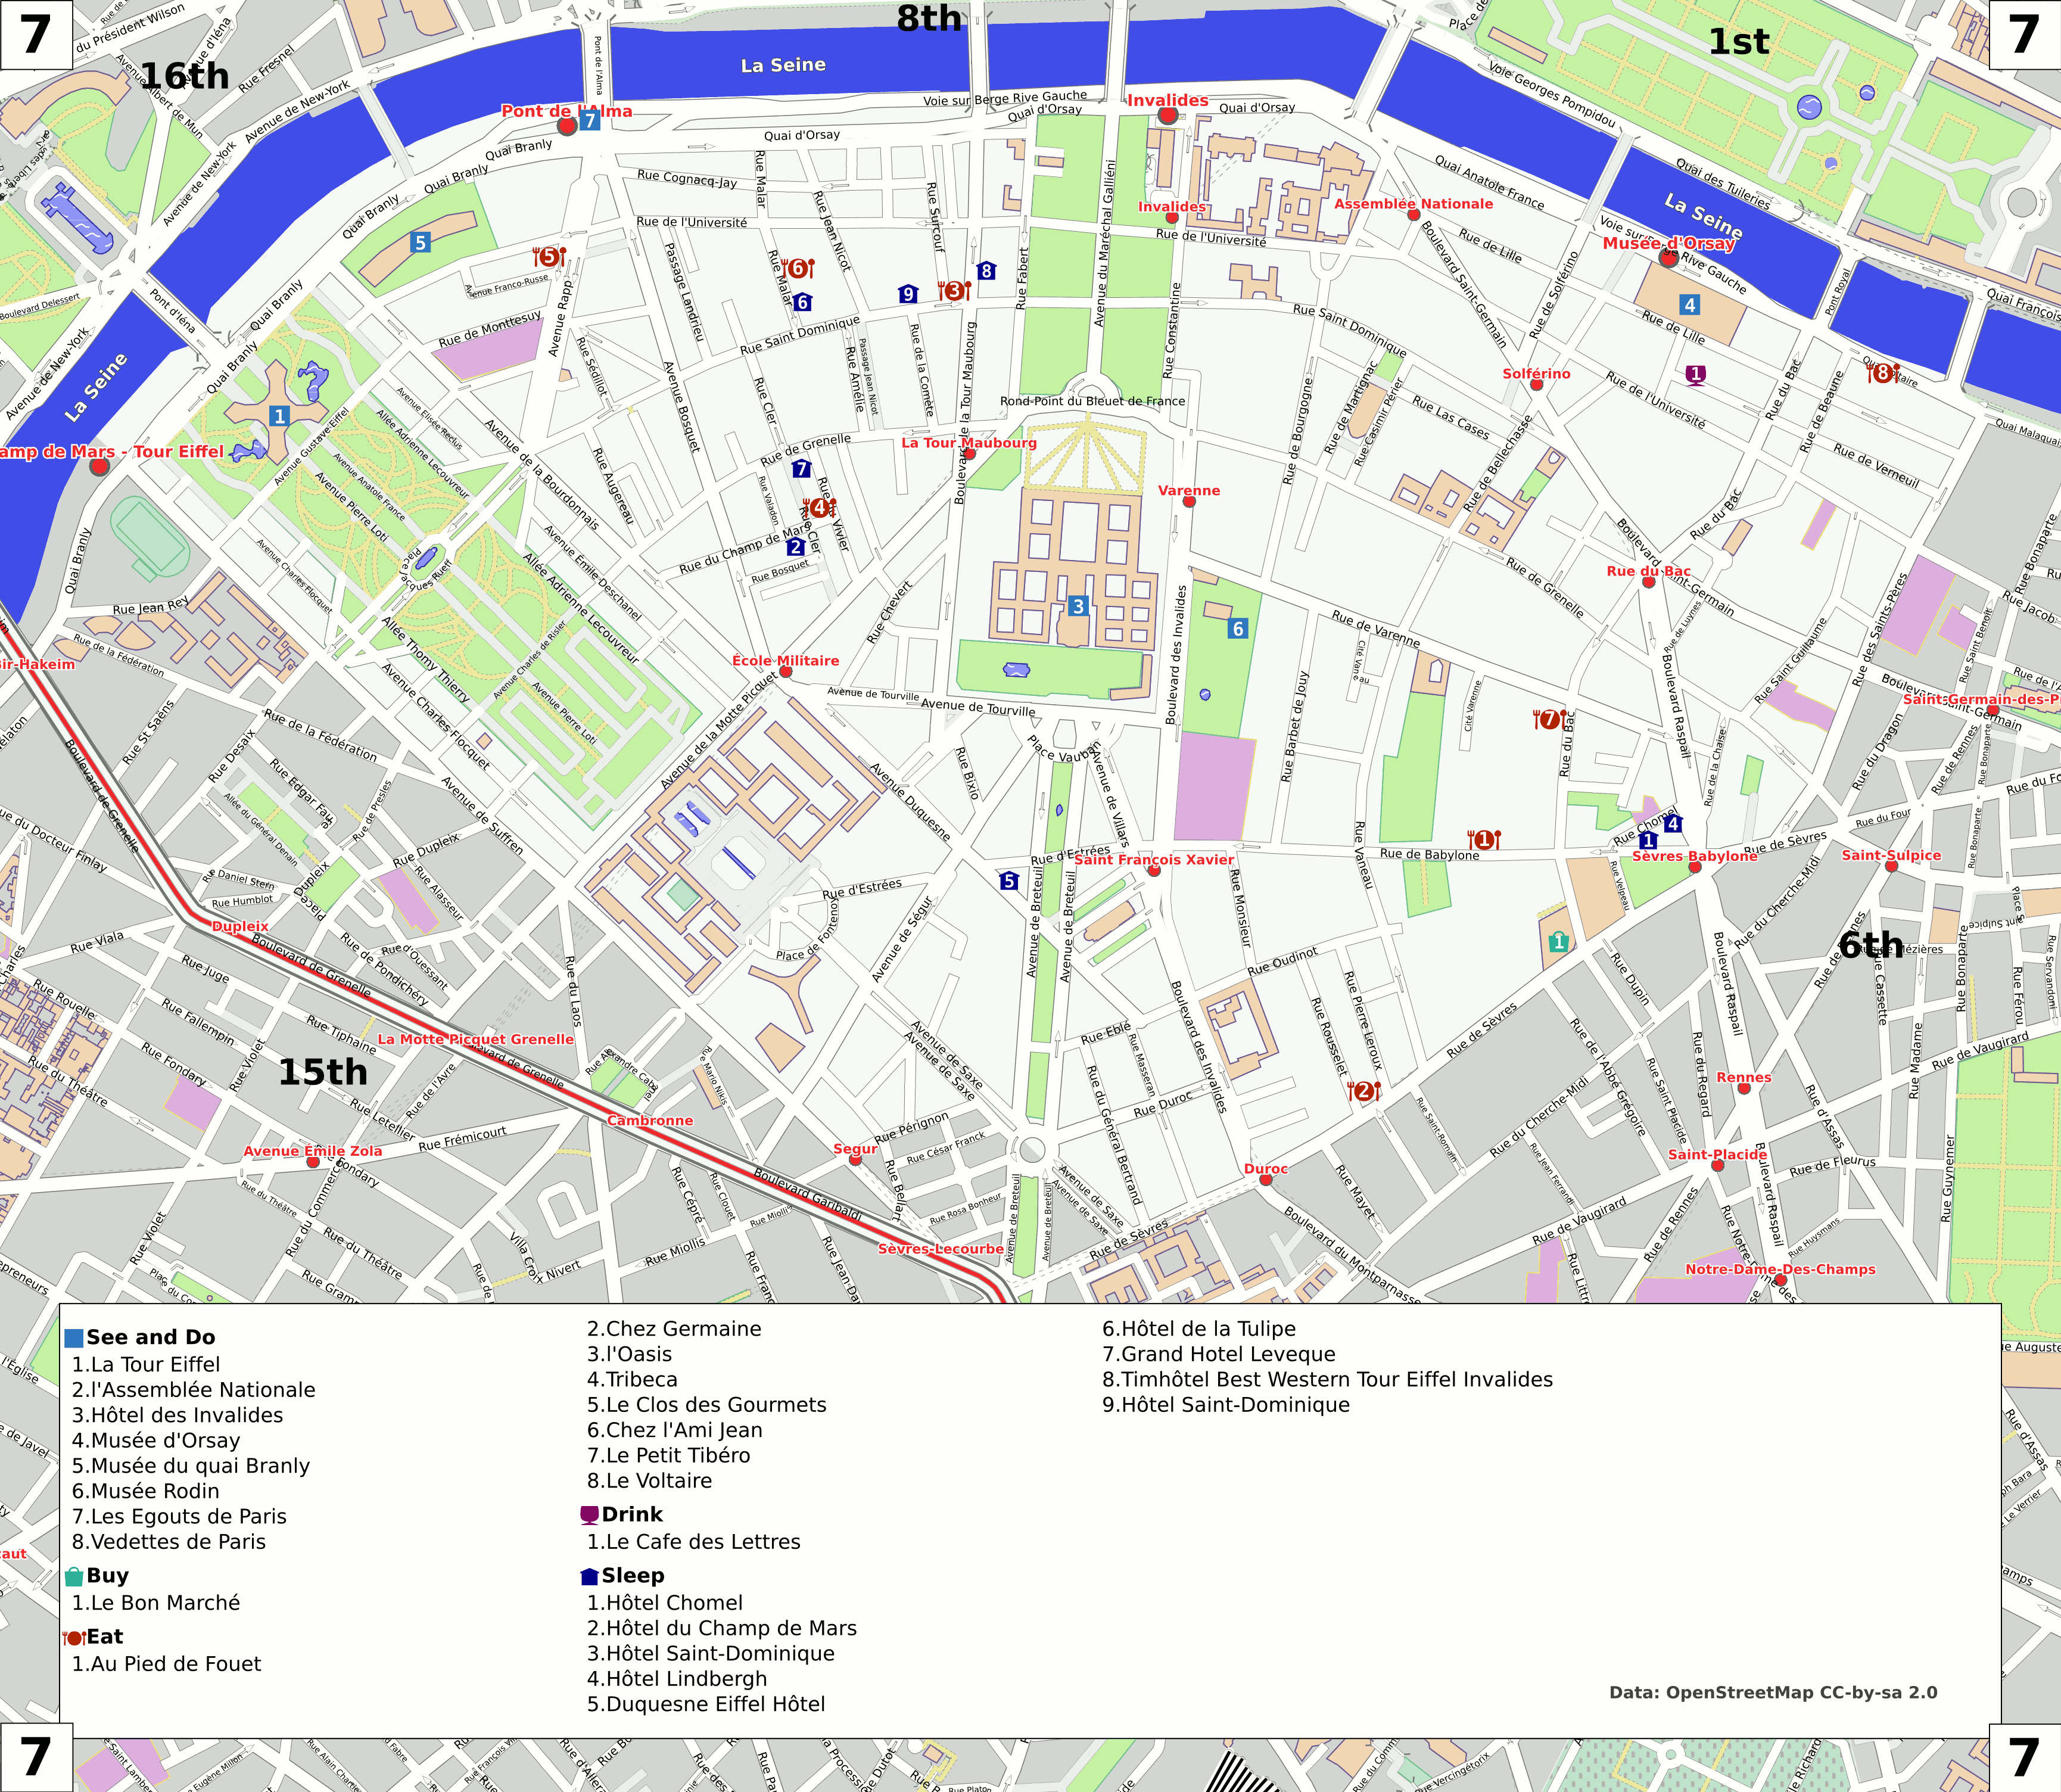 file paris 7th arrondissement map with listings